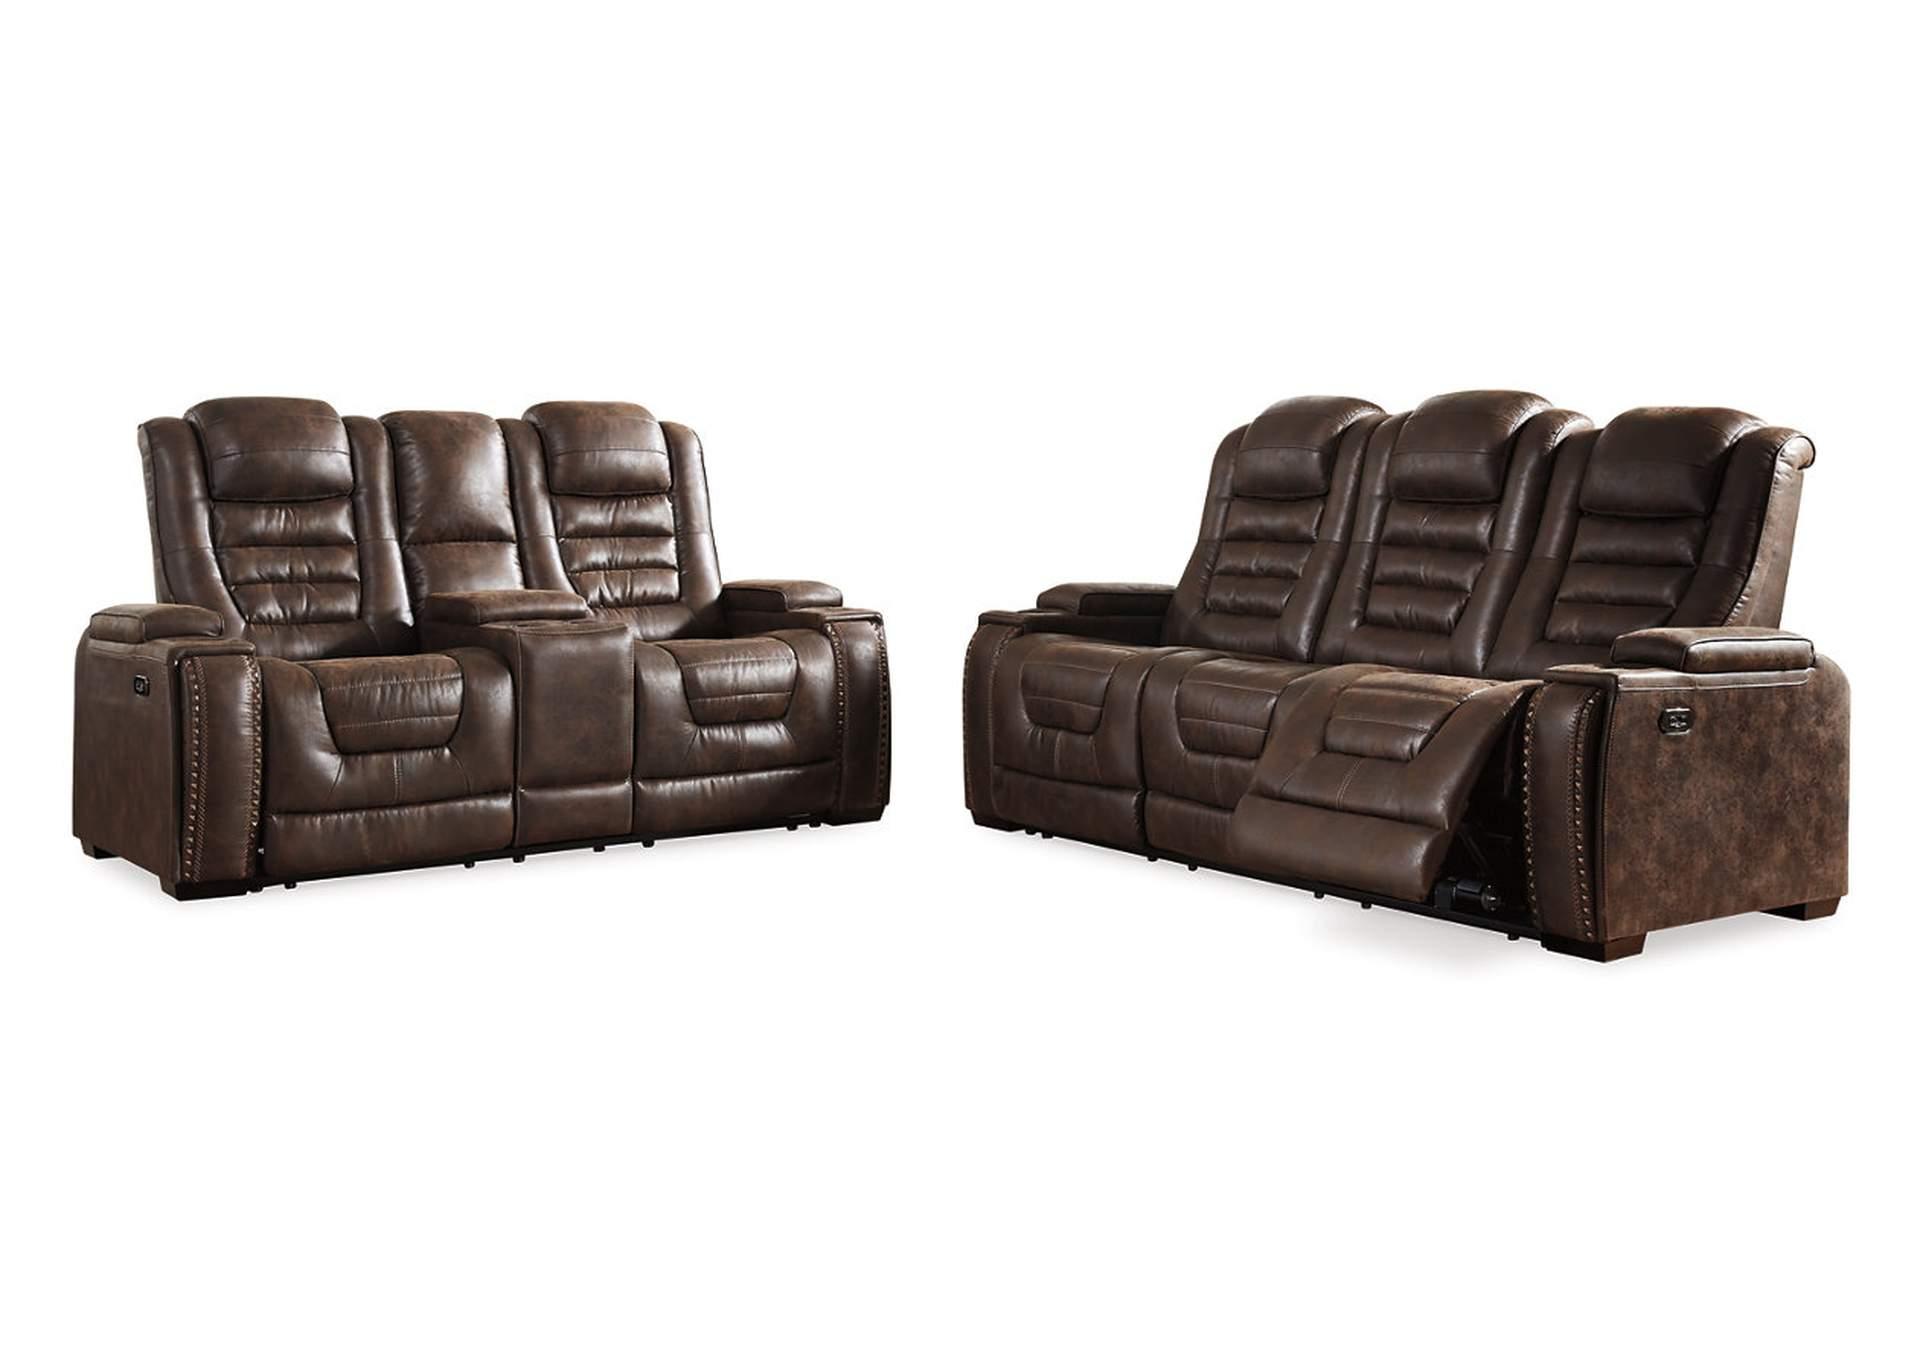 Juego de zona de alimentación de sofá reclinable y sofá de doble plaza c/reposacabezas ajusmesa